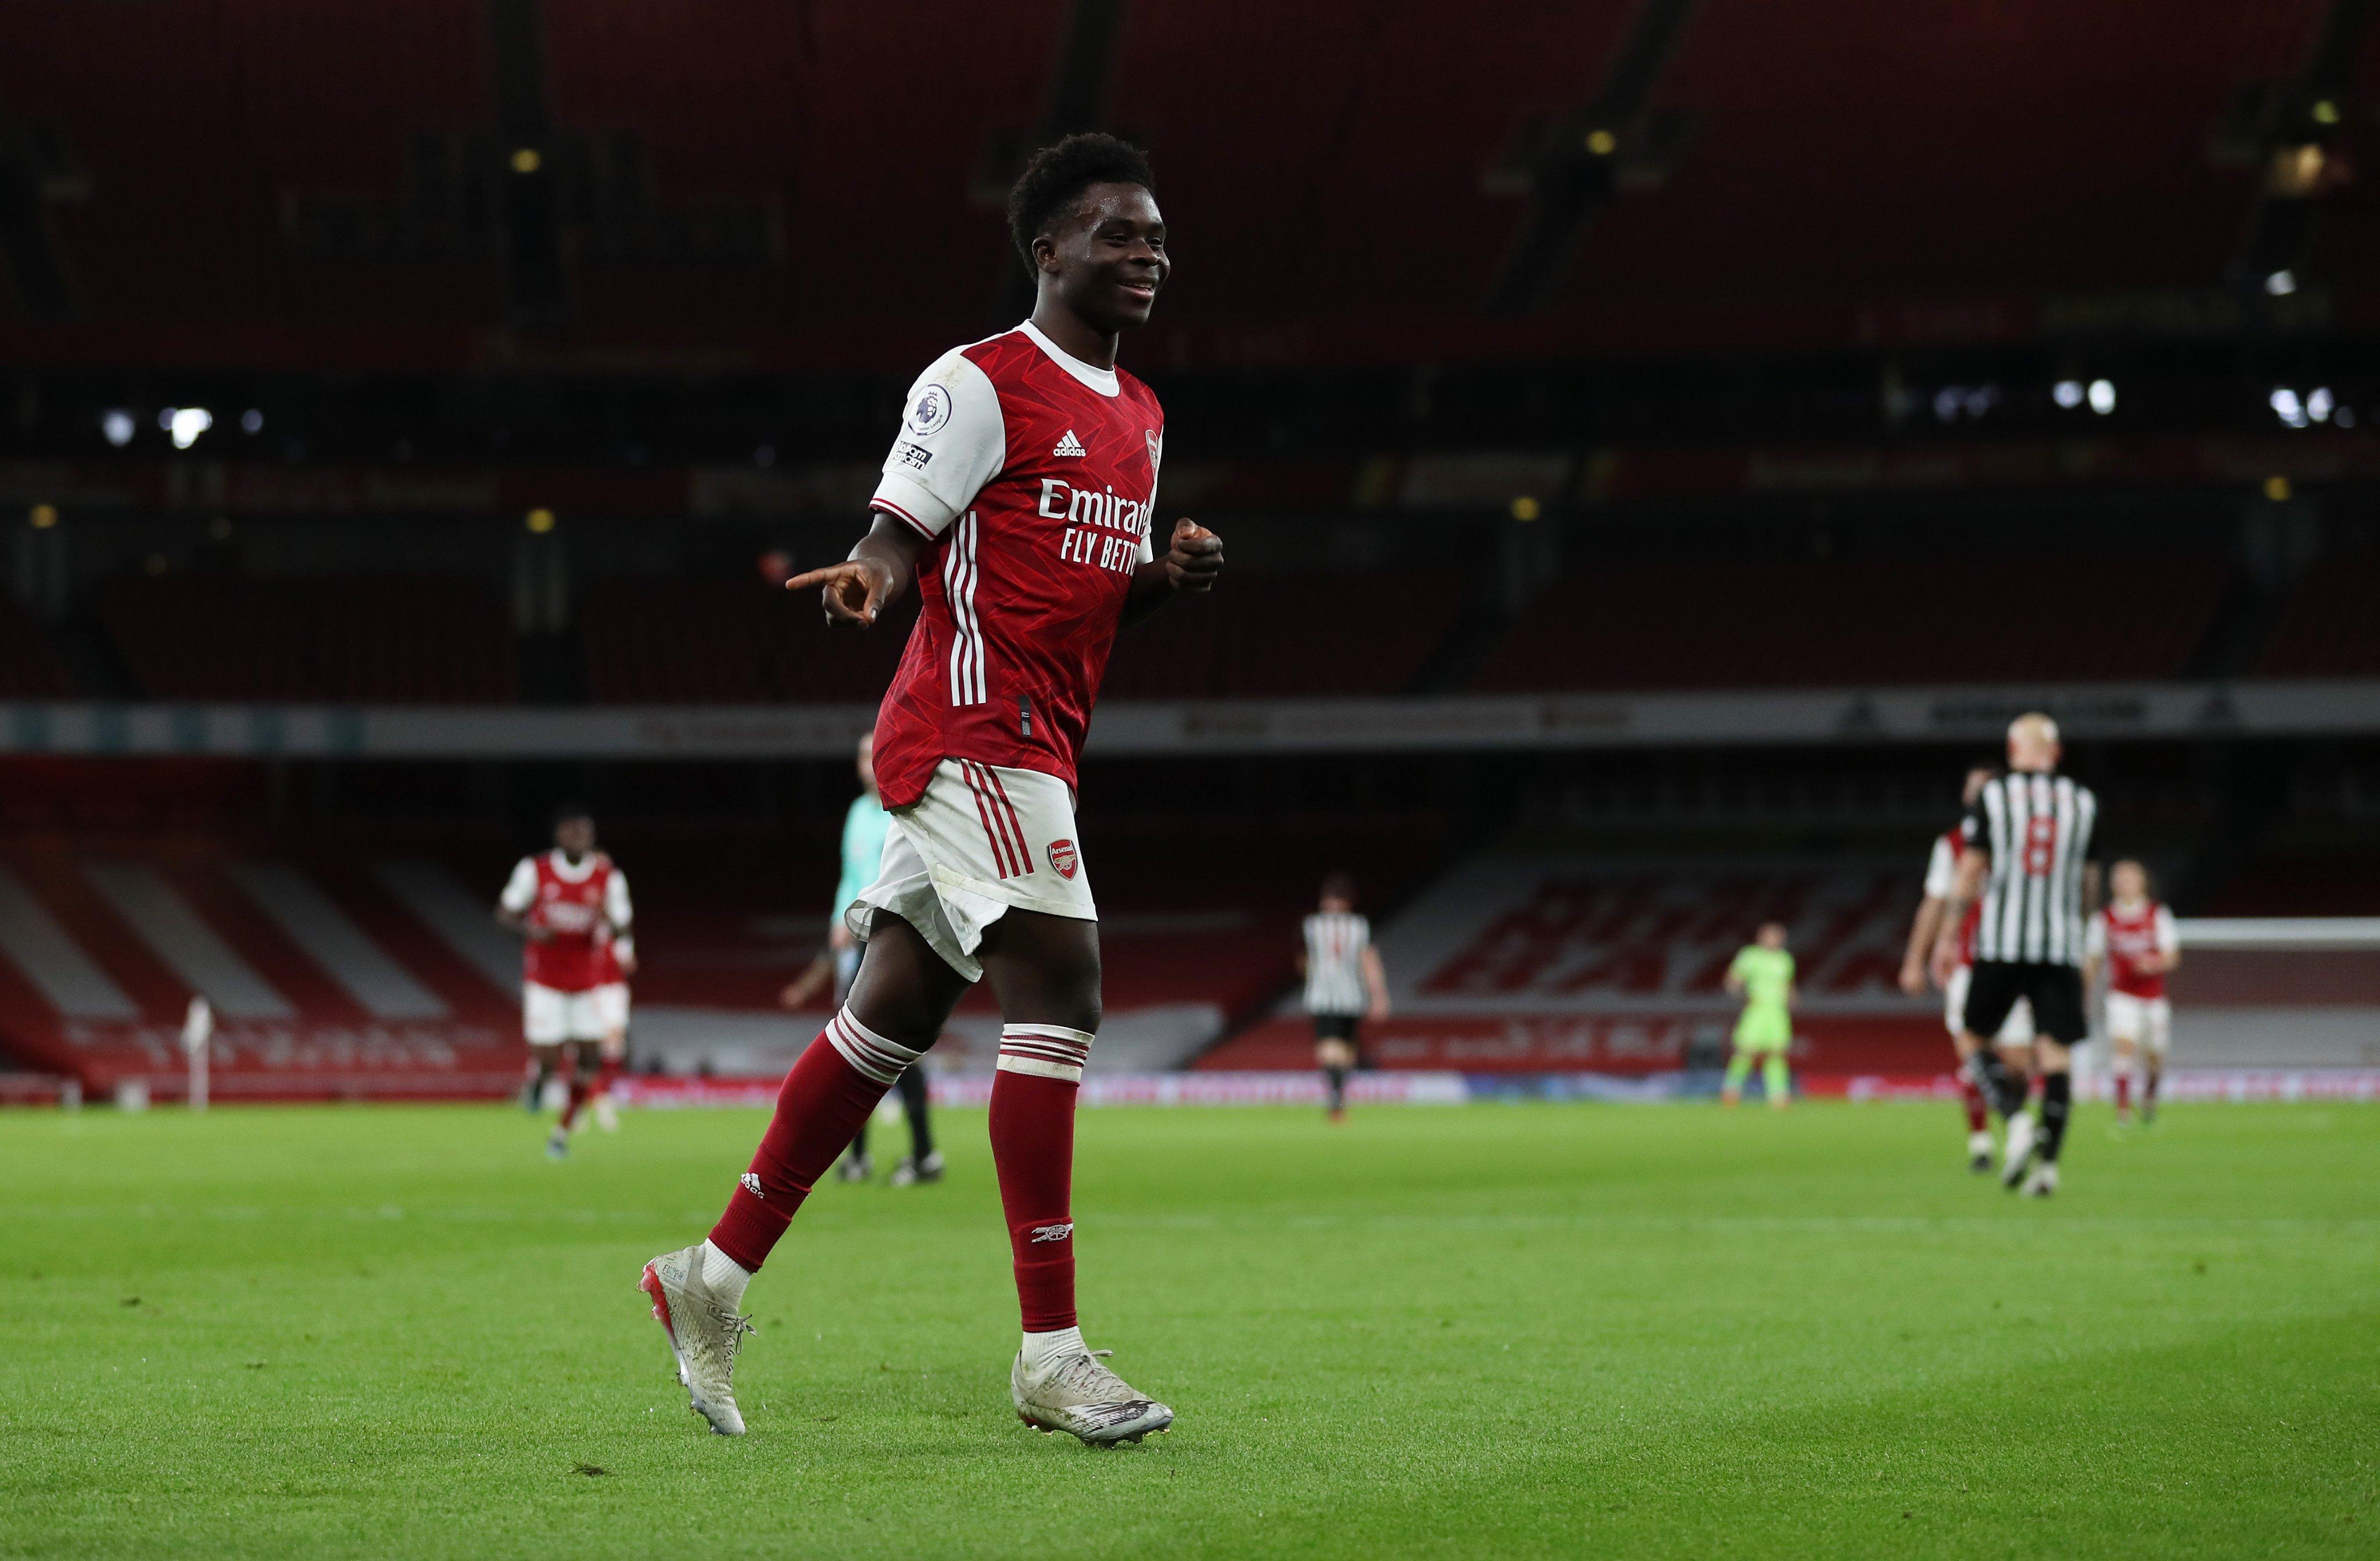 Bukayo Saka celebrates his goal at Emirates Stadium